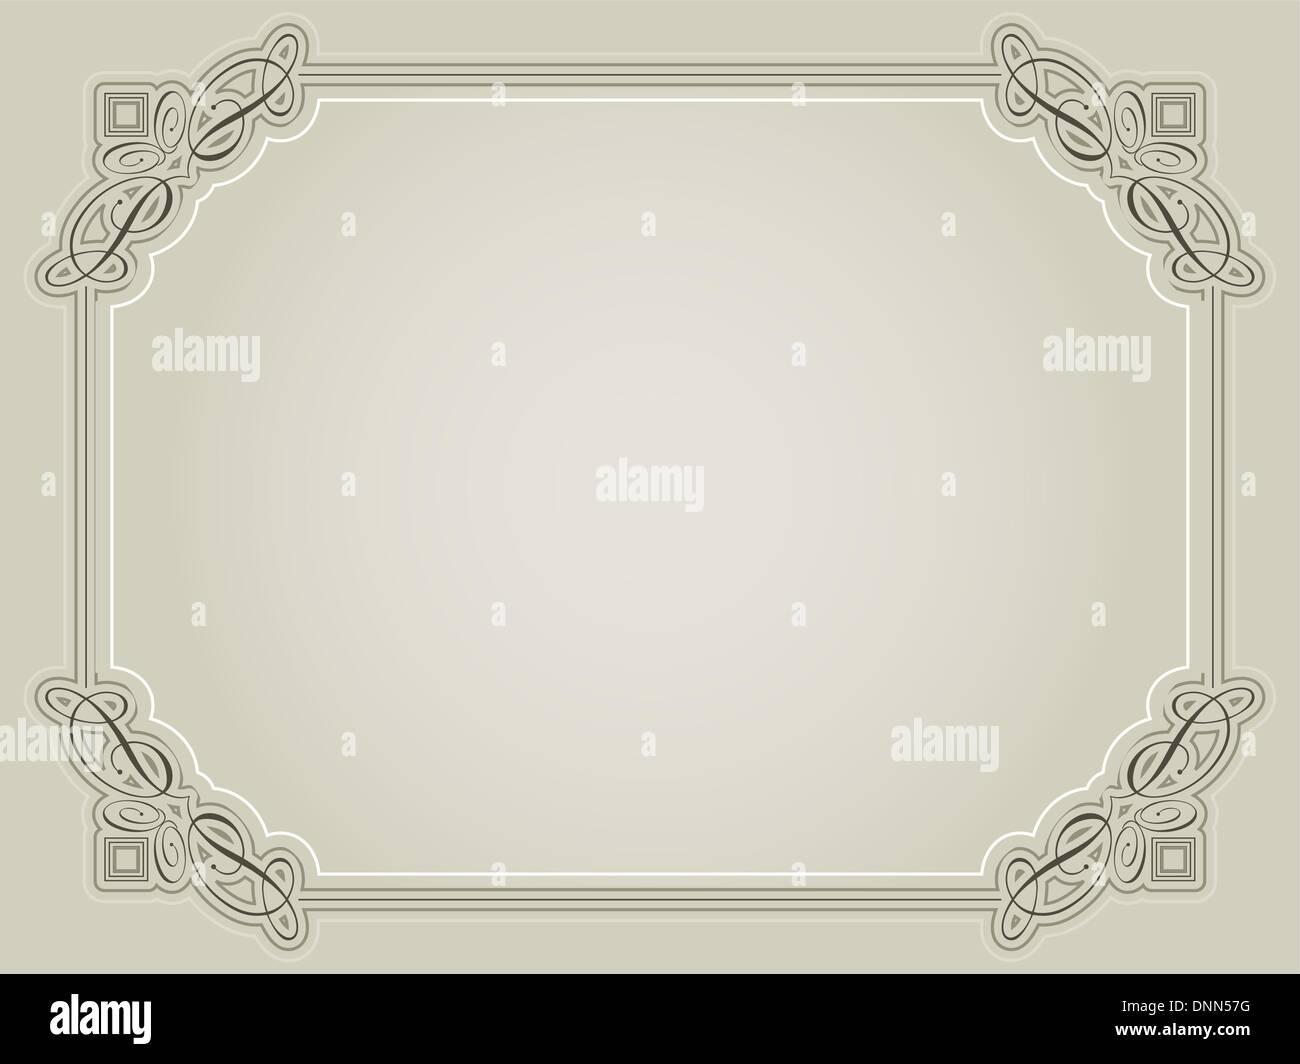 Decorative certificate background in sepia tones - Stock Image